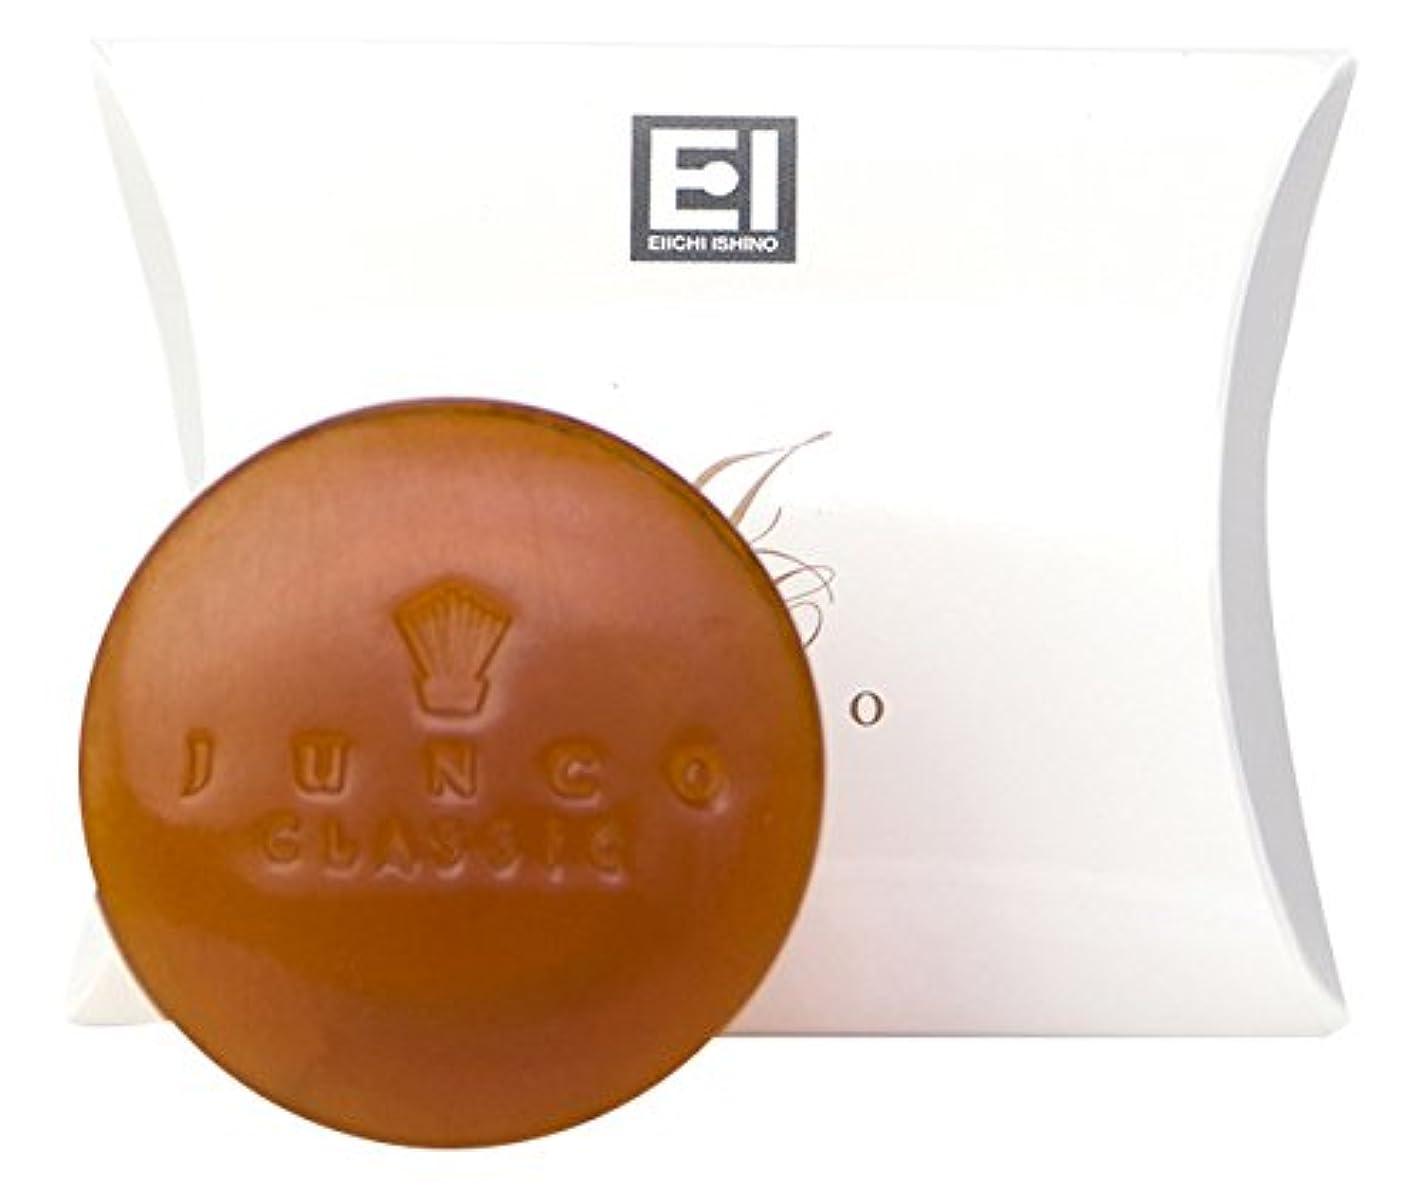 中古雑品羊EI JUNCO CLASSIC SOAP 10g